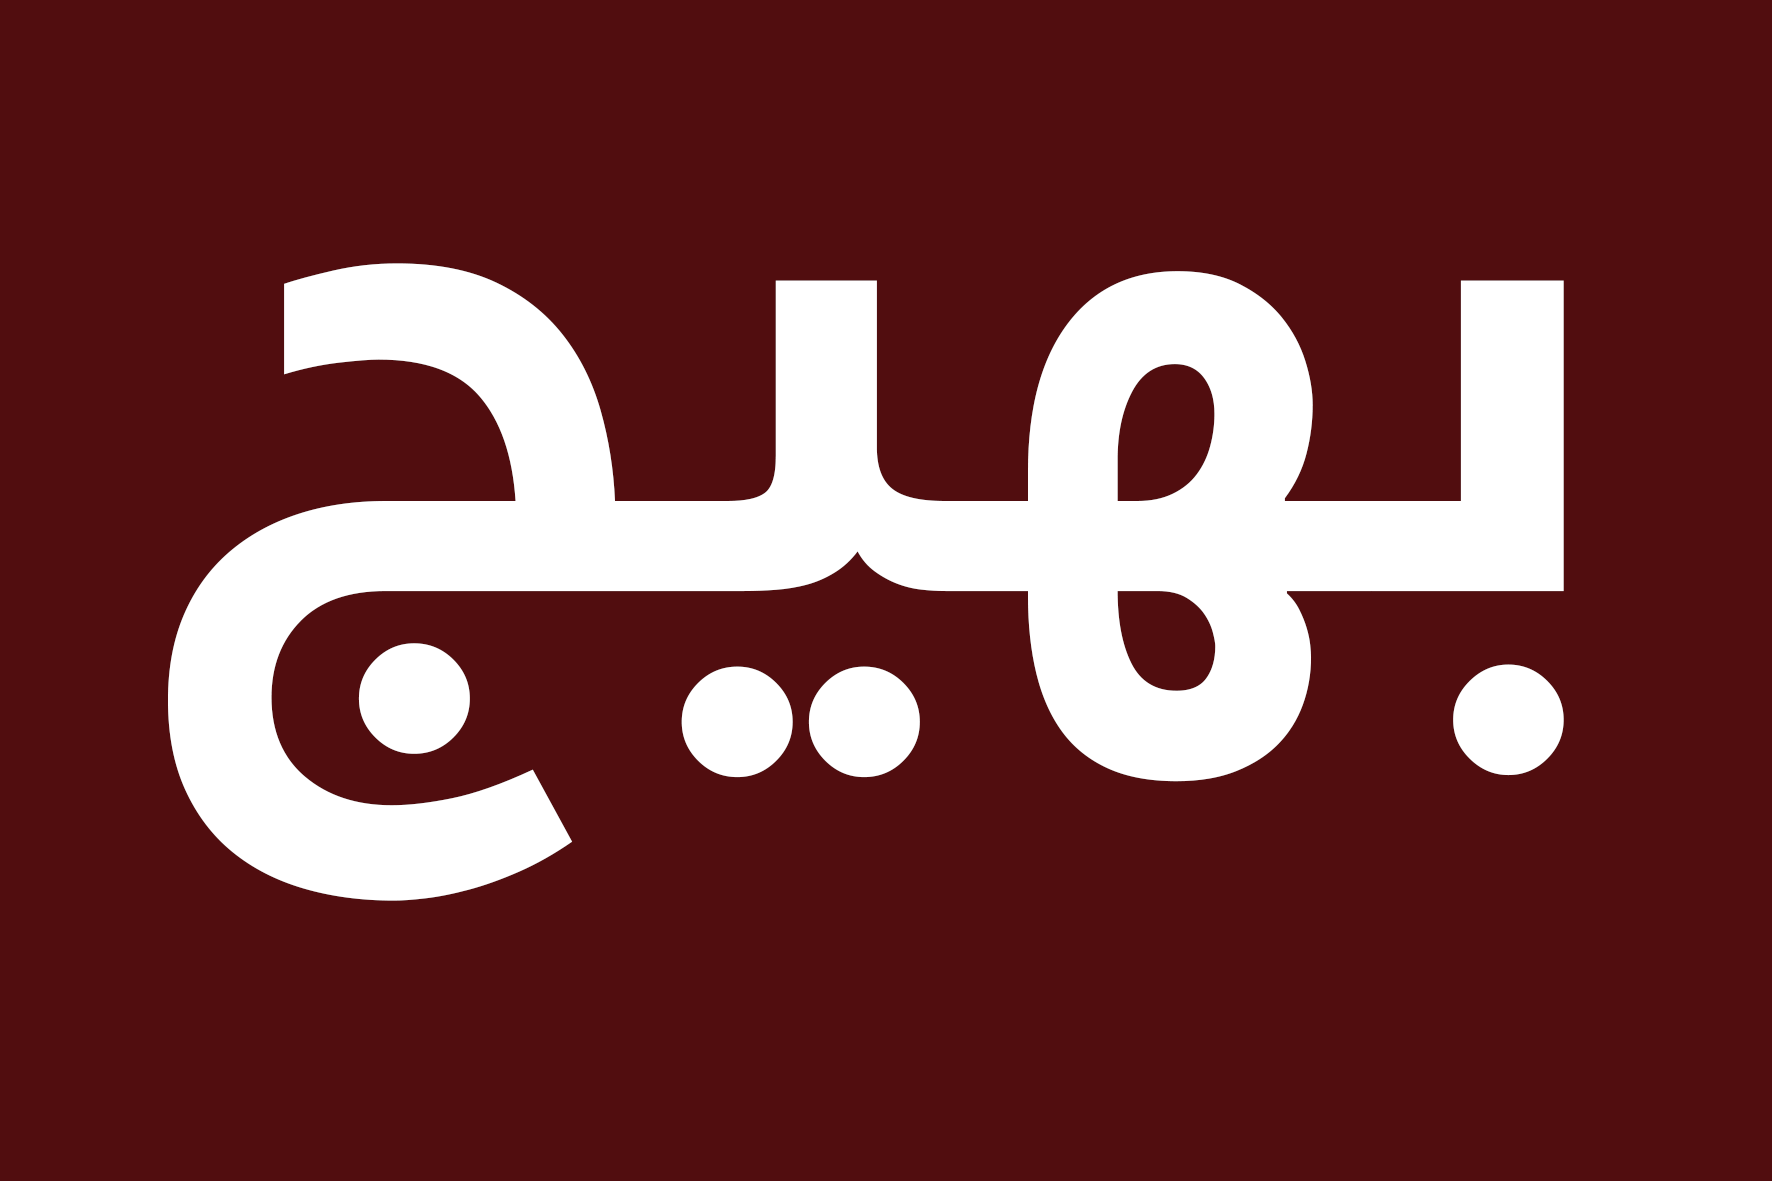 Bahij Helvetica Neue-Bold by BahijVirtualAcademy on DeviantArt